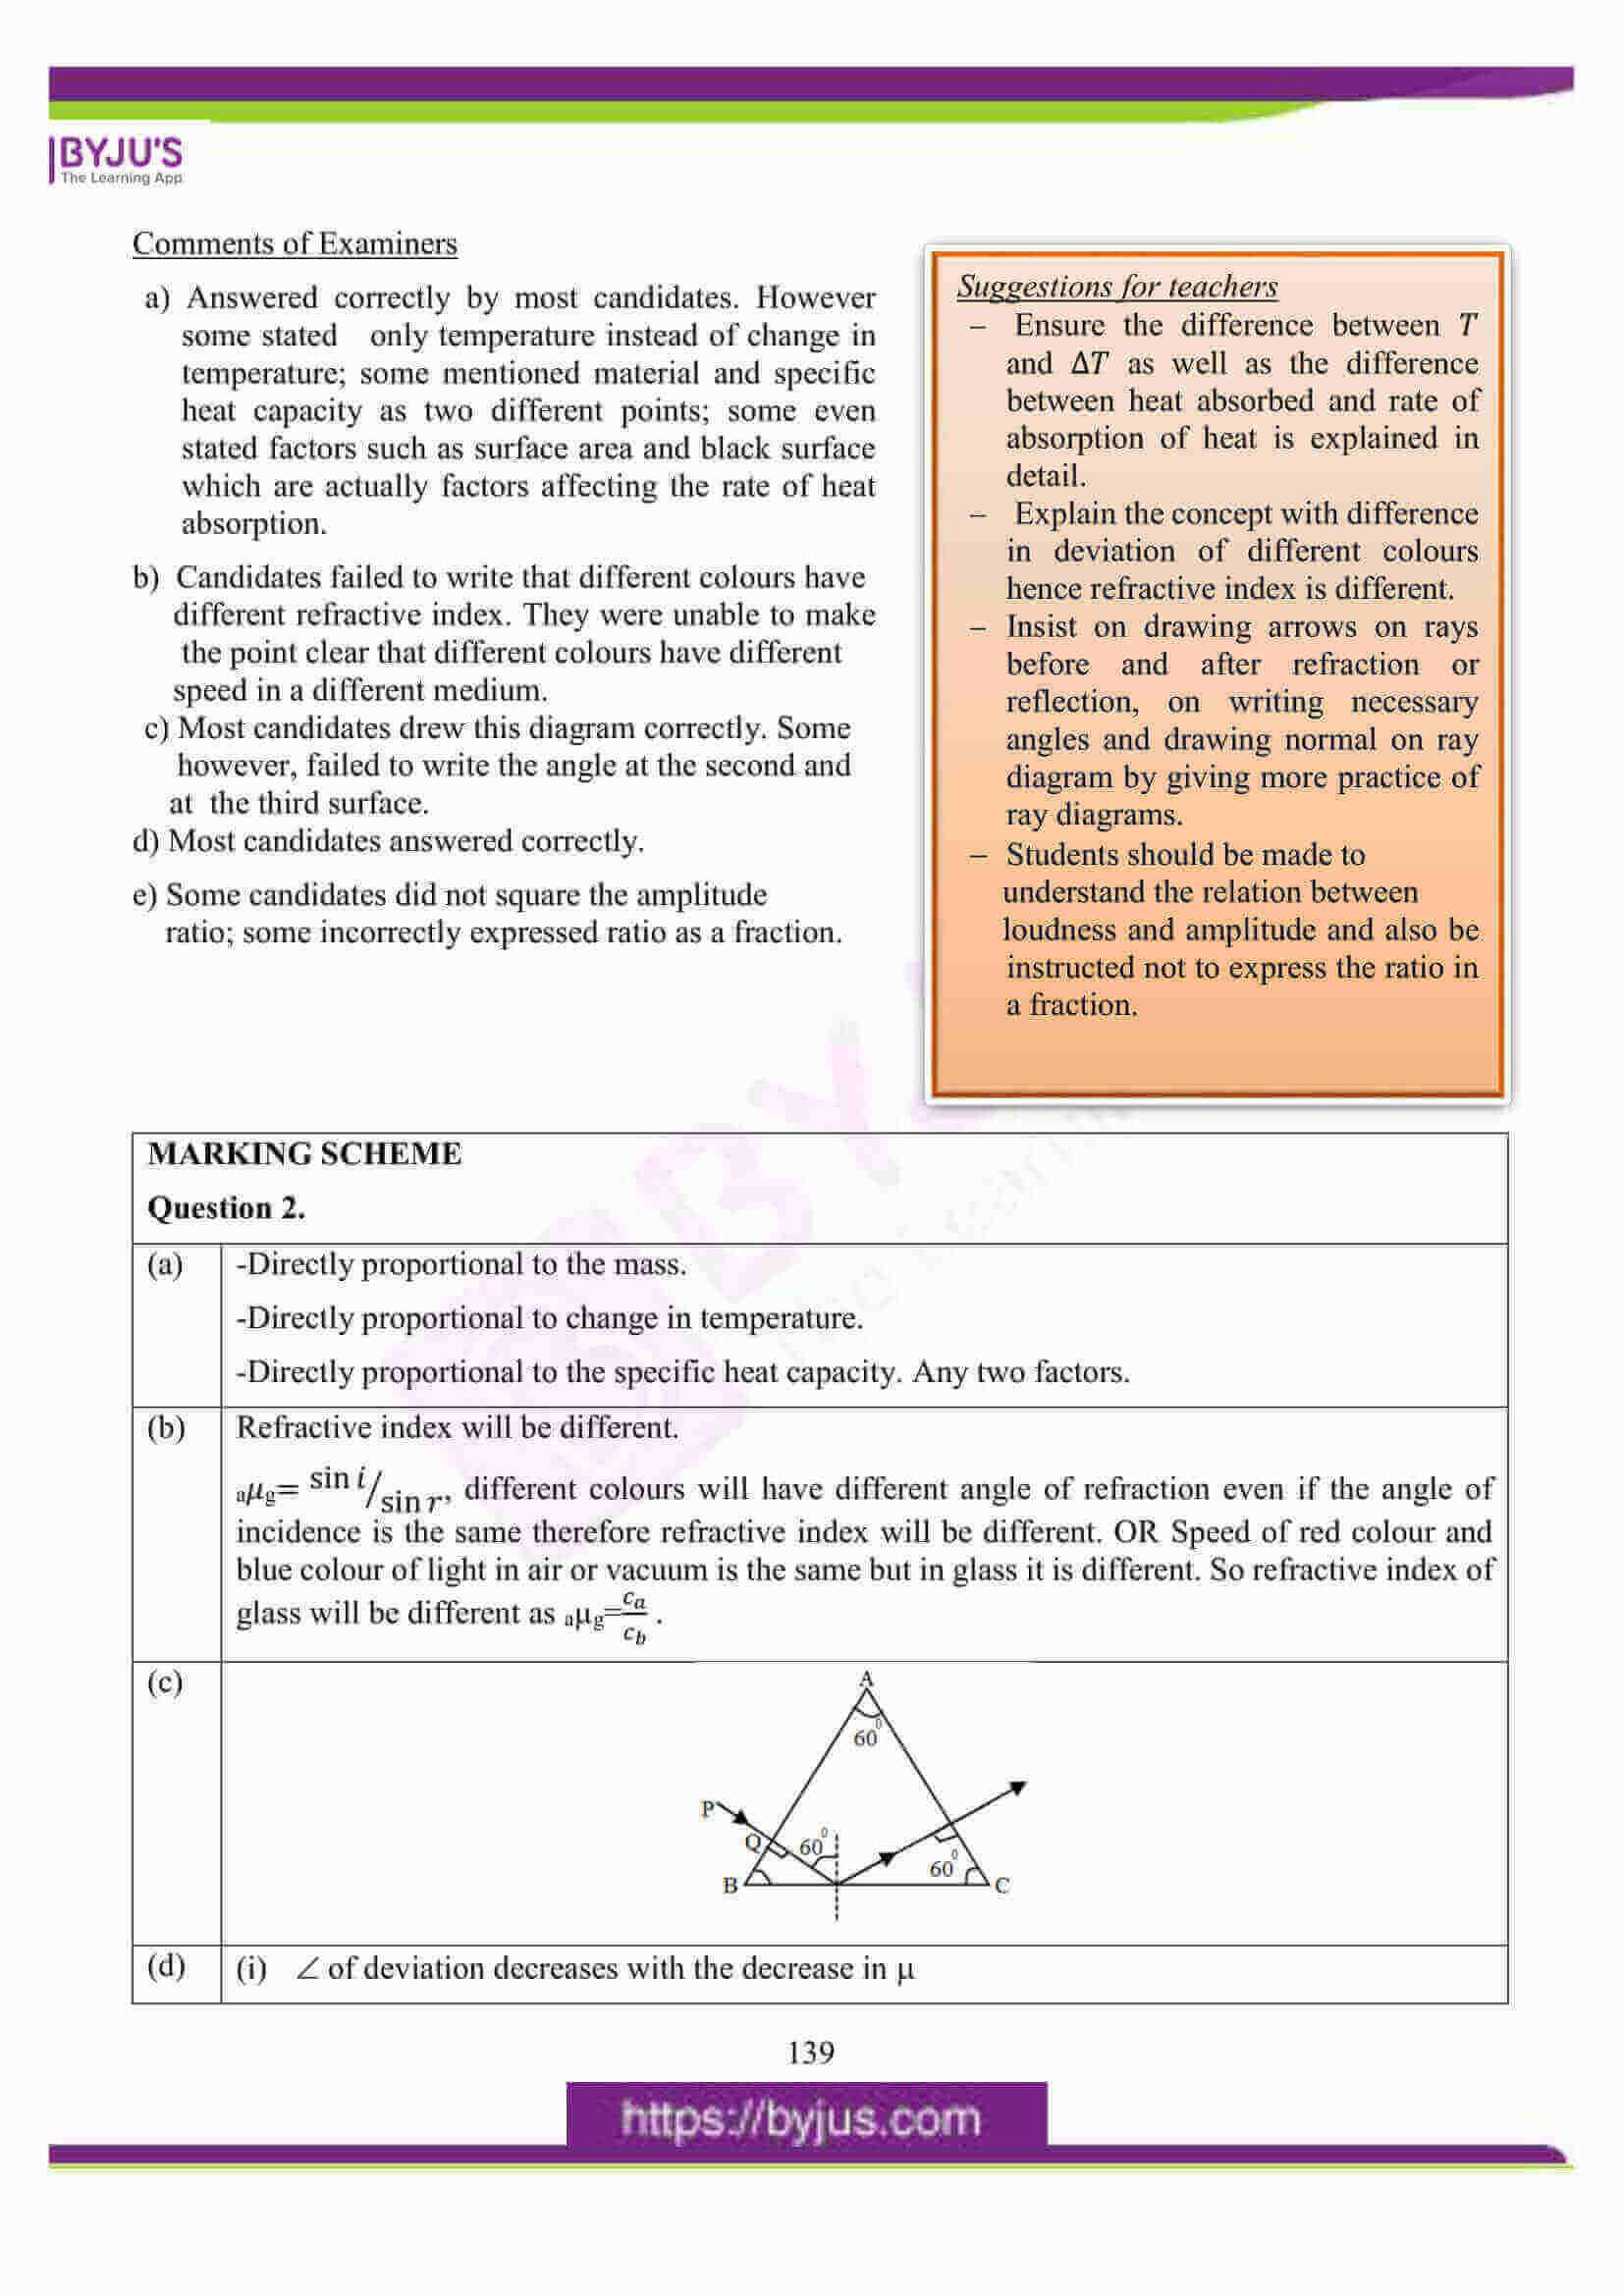 icse class 10 physics question paper solution 2016 04